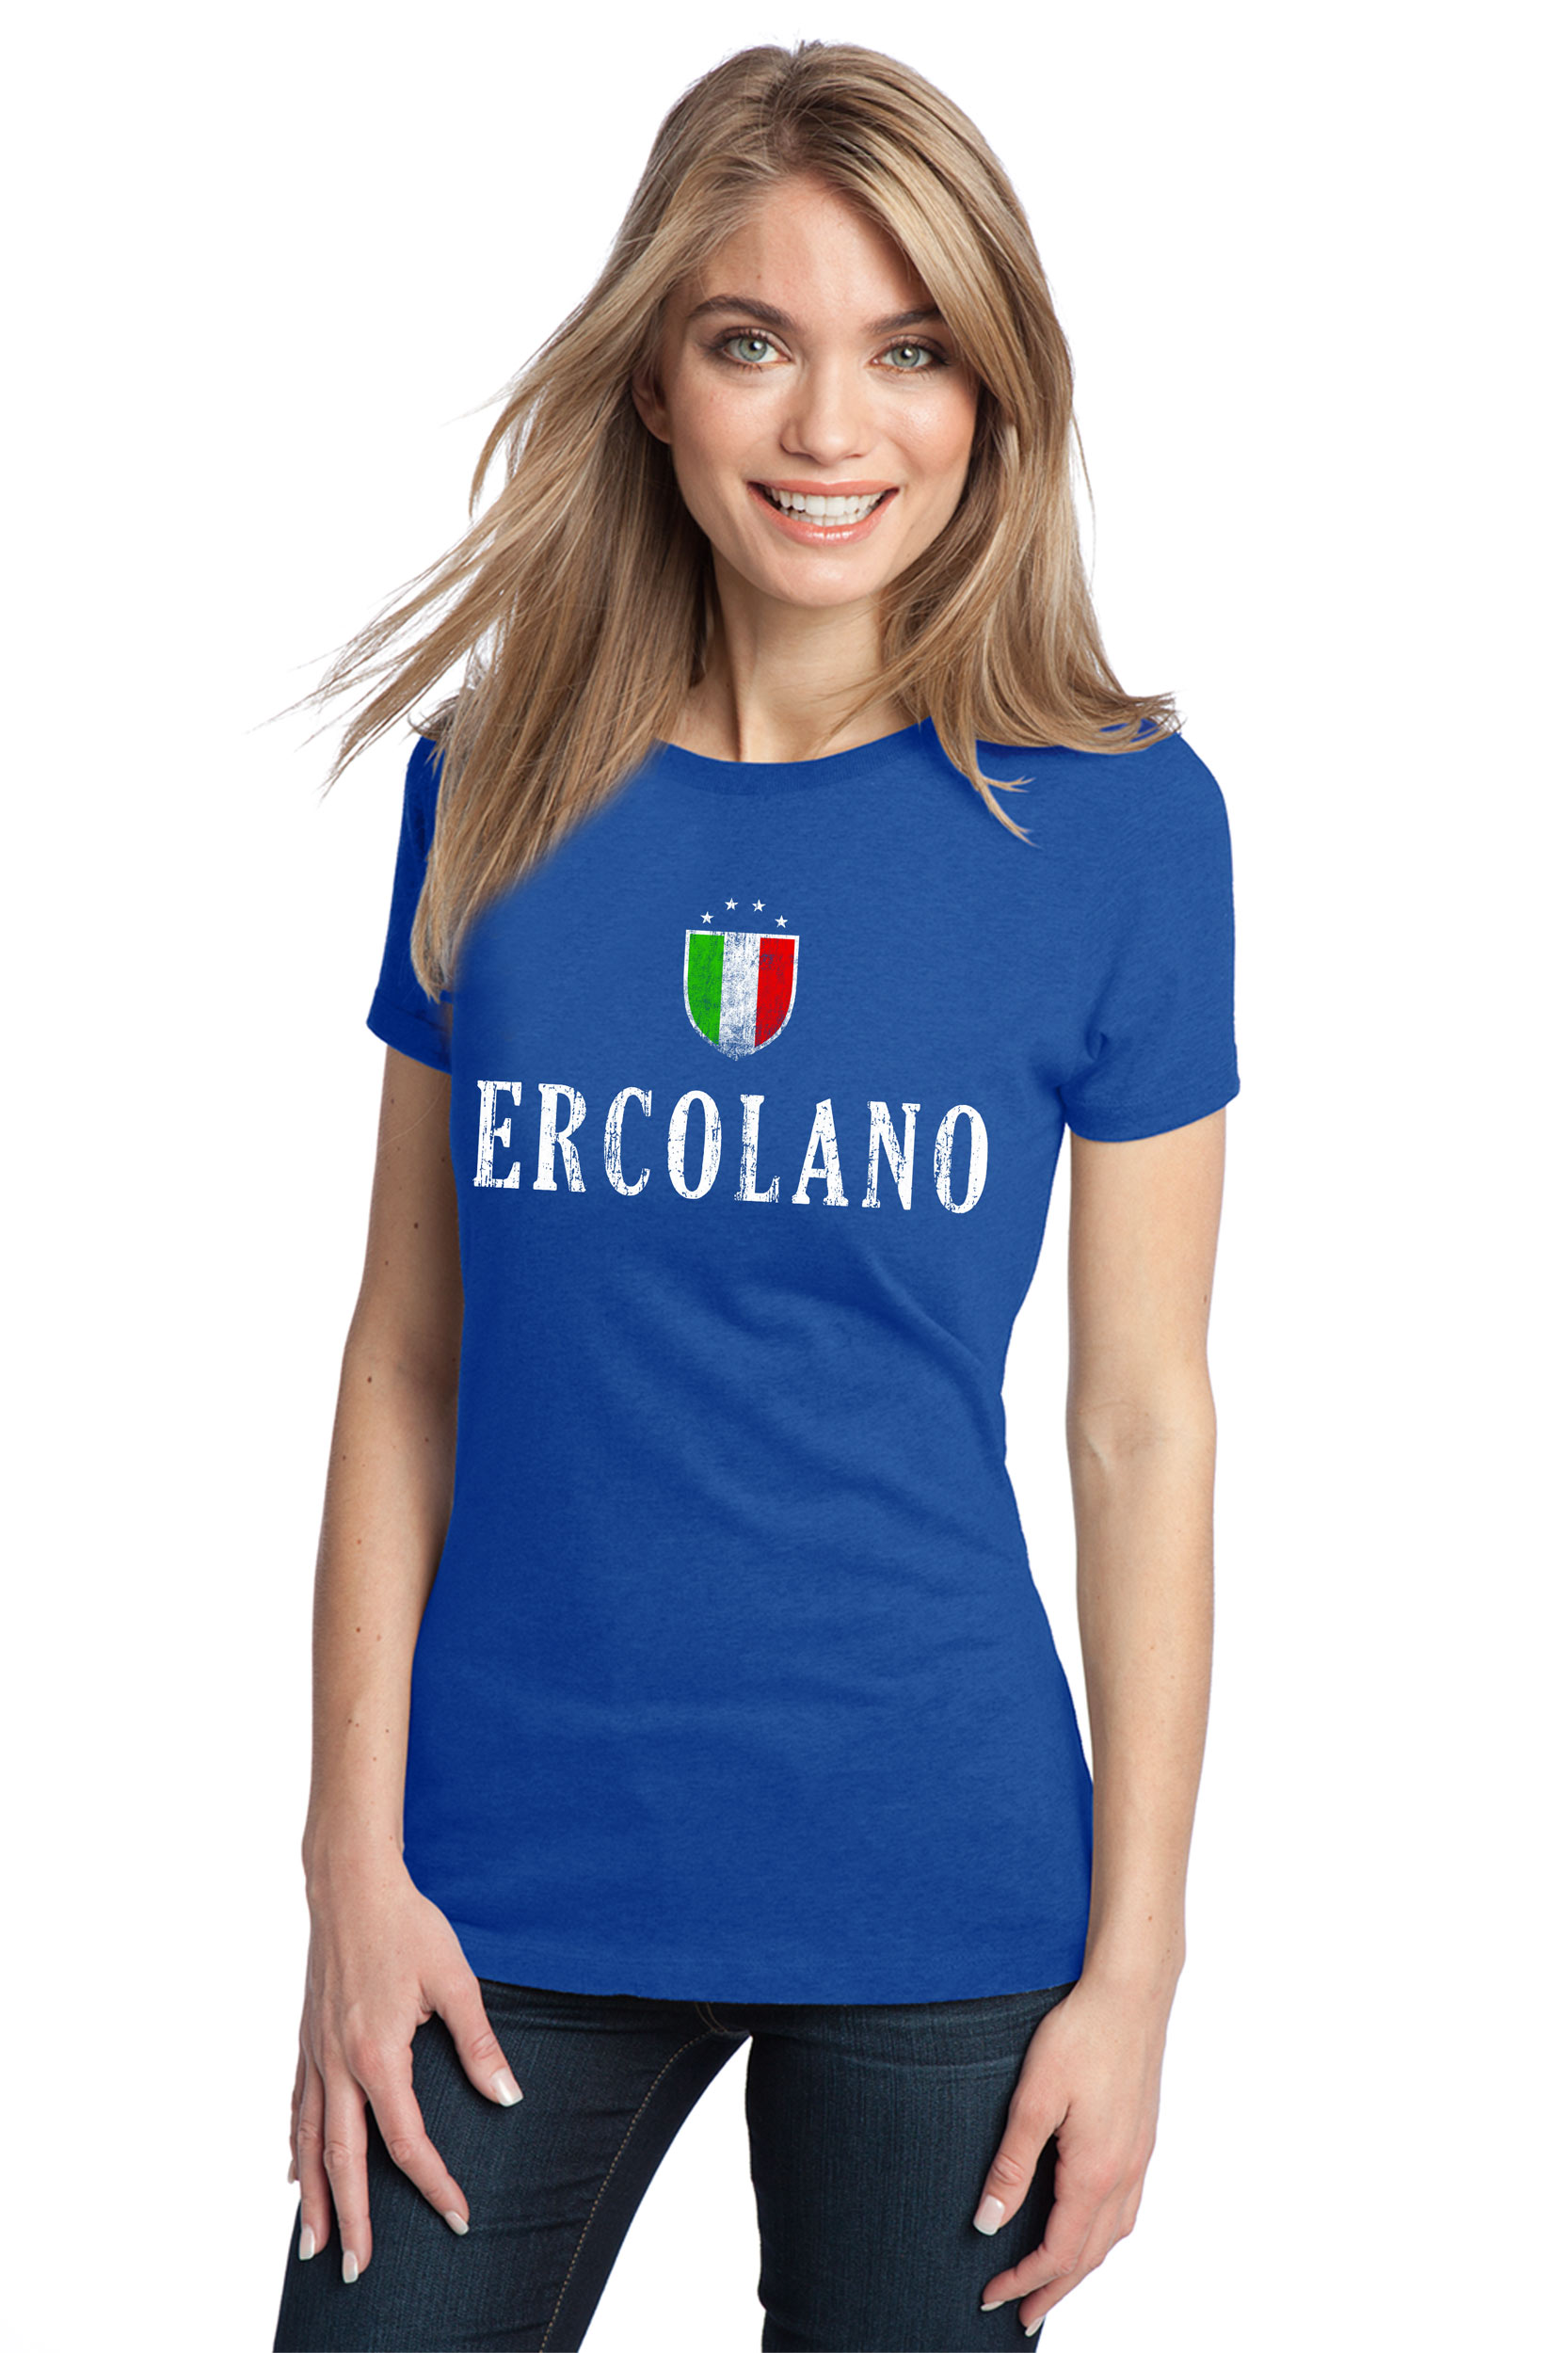 Ercolano Italy  city photos gallery : ERCOLANO ITALY Adult Ladies Vintage Look T shirt Campania Italian City ...